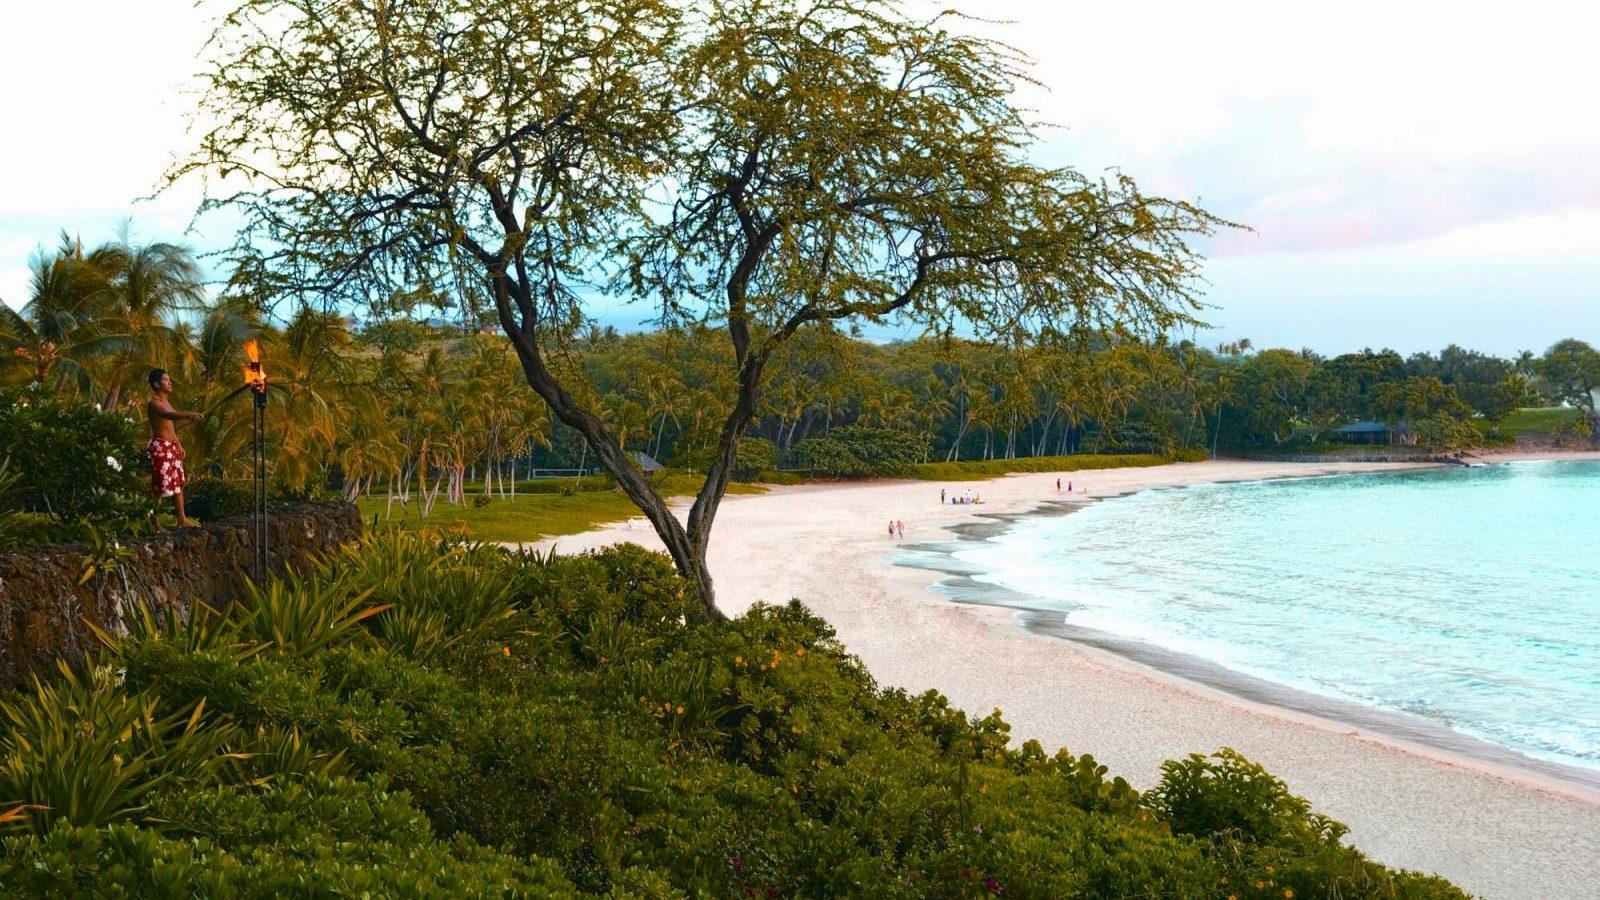 mauna kea resort - HD1600×900